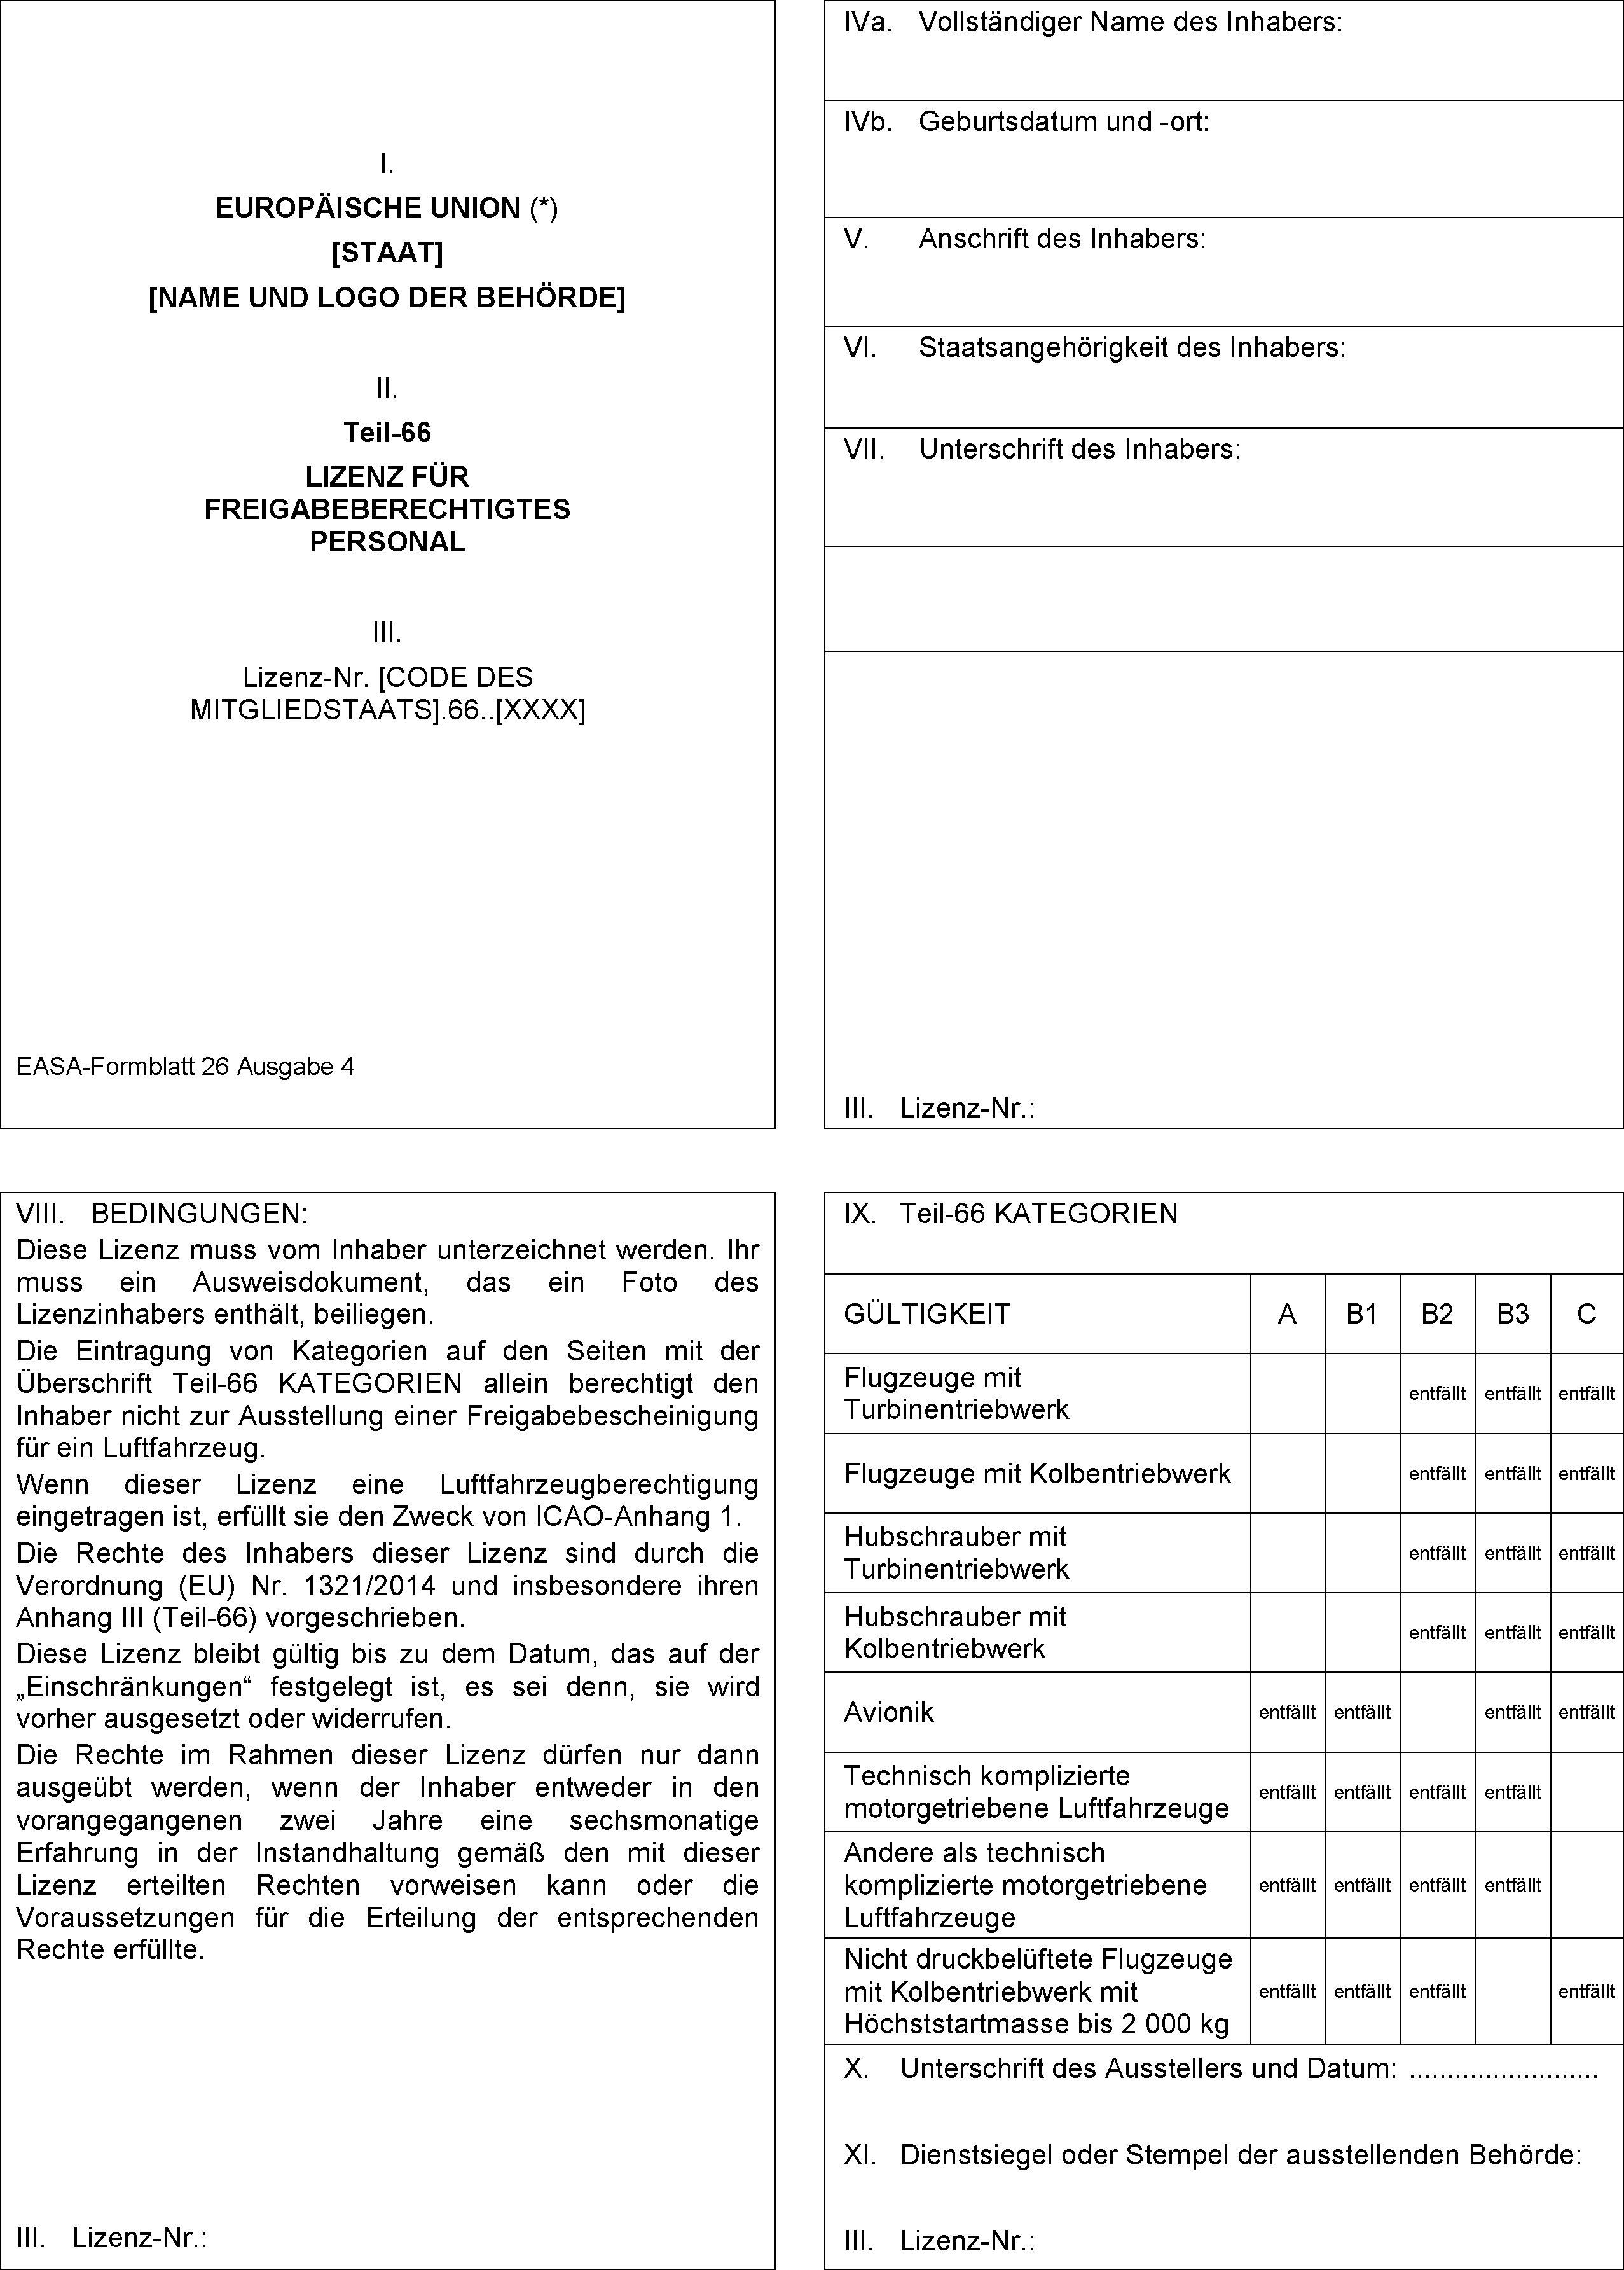 EUR-Lex - 02014R1321-20170320 - EN - EUR-Lex